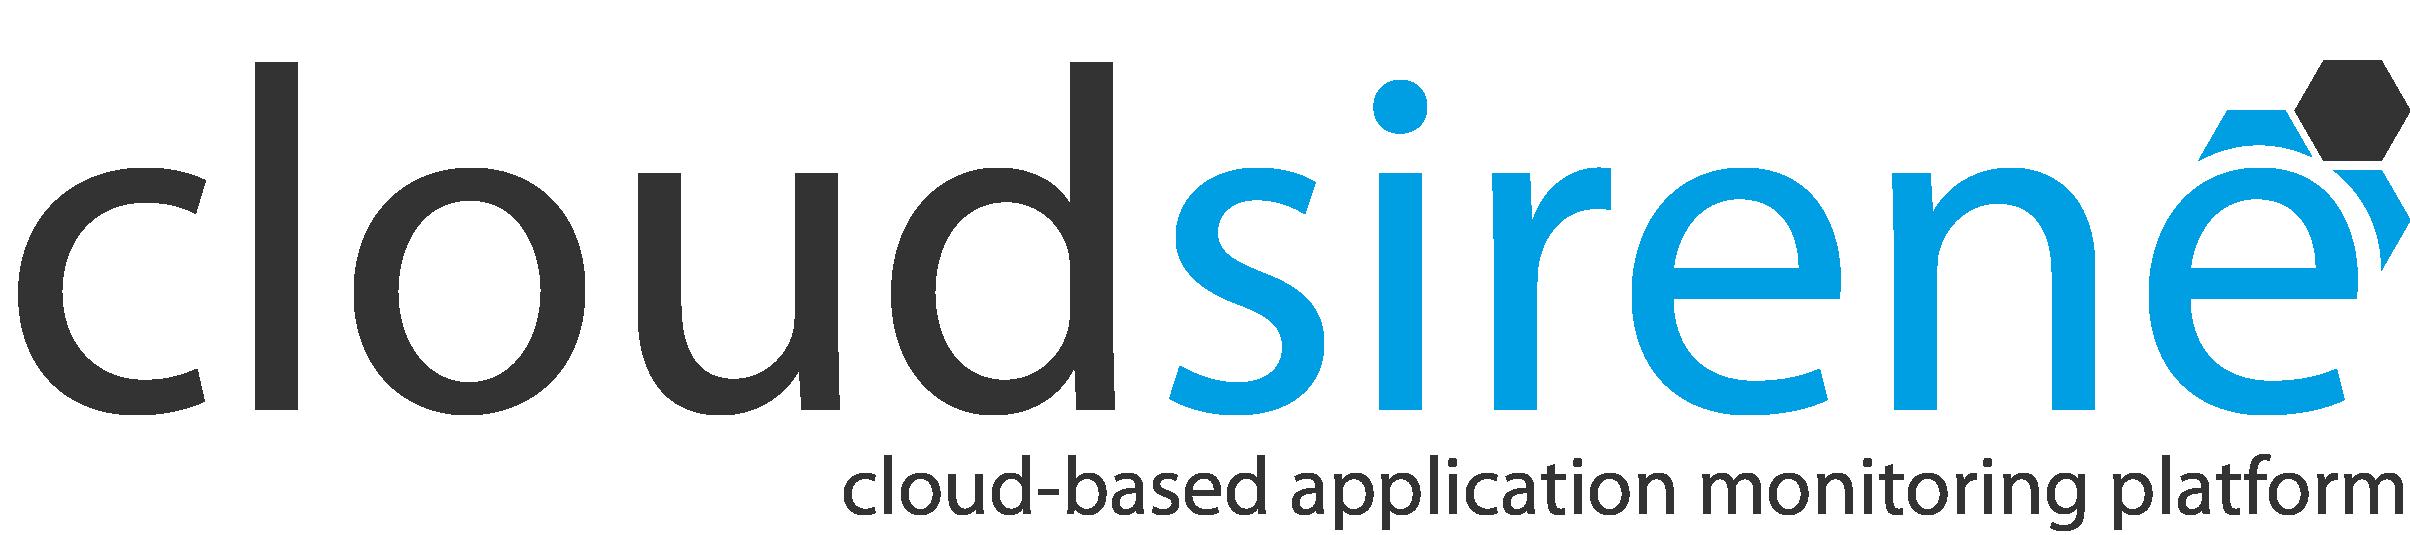 cloudsirene logo